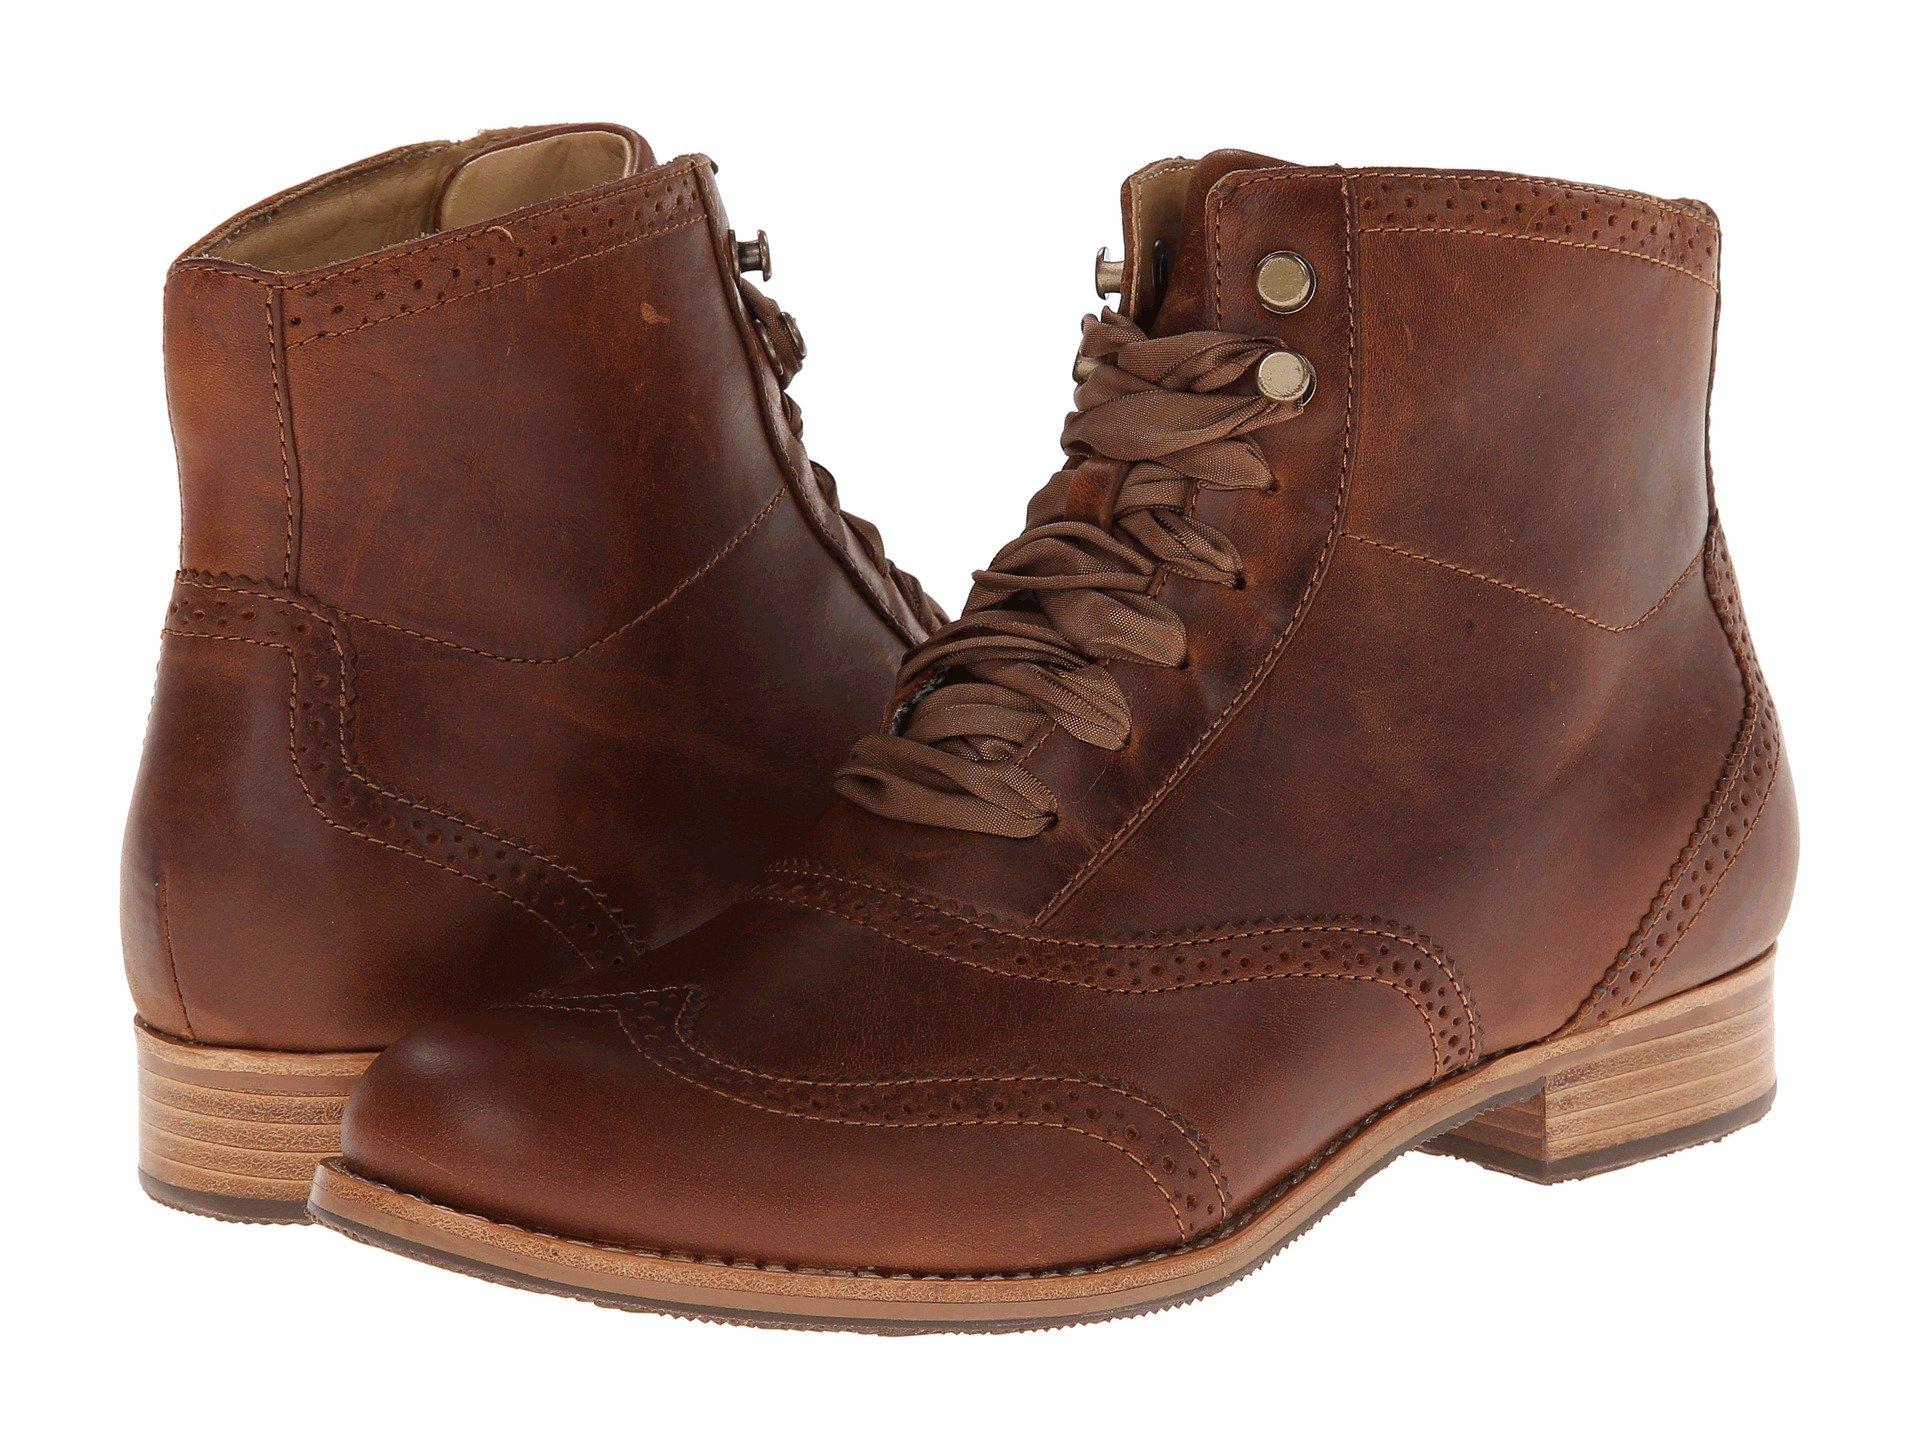 New Sebago Claremont Boot Women's Lace-up Boots, Cognac Leather